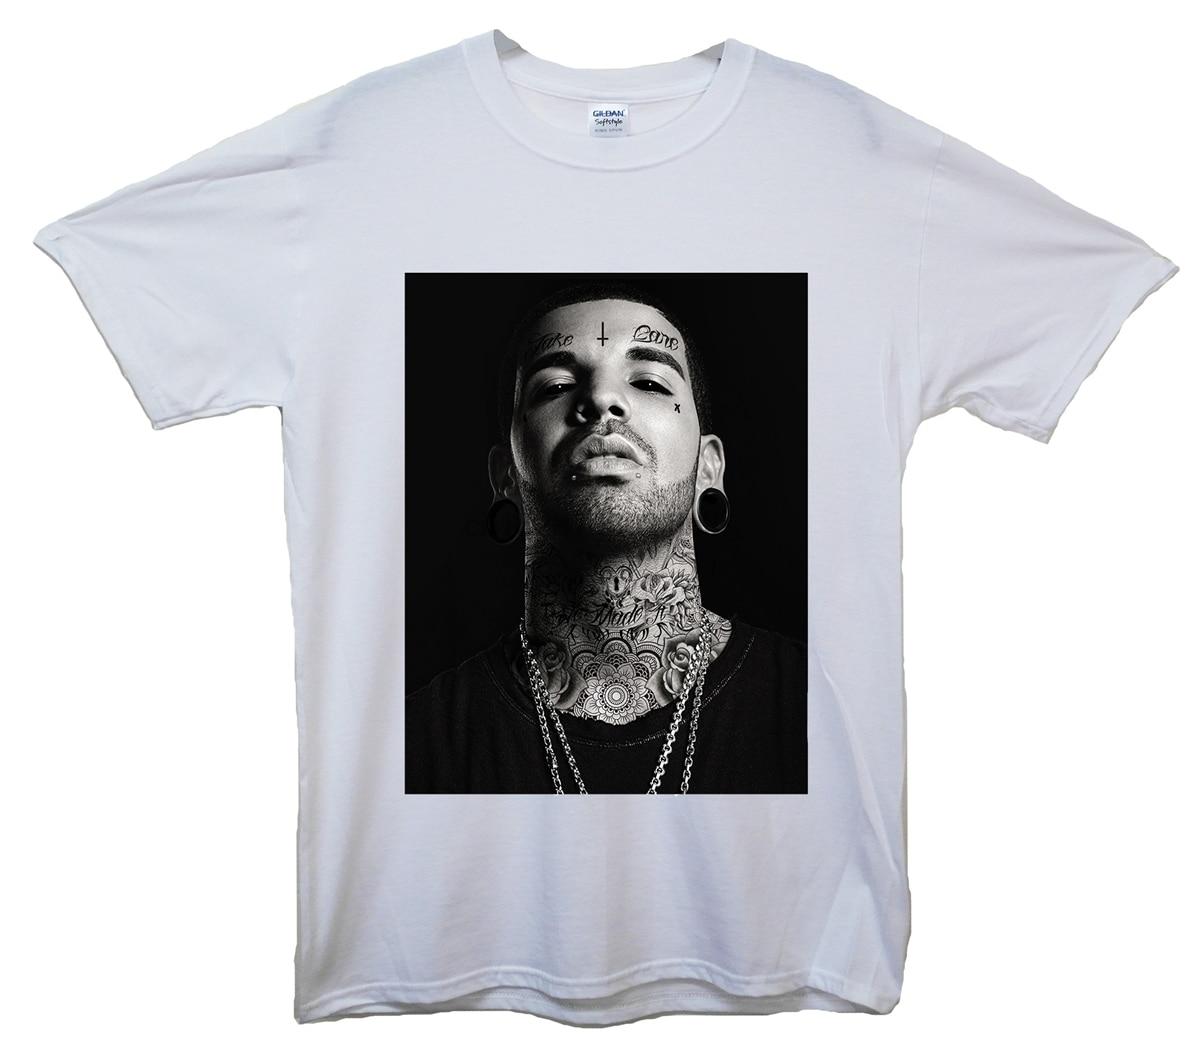 Camiseta de manga corta para hombre, camiseta de marca Drake Defaced